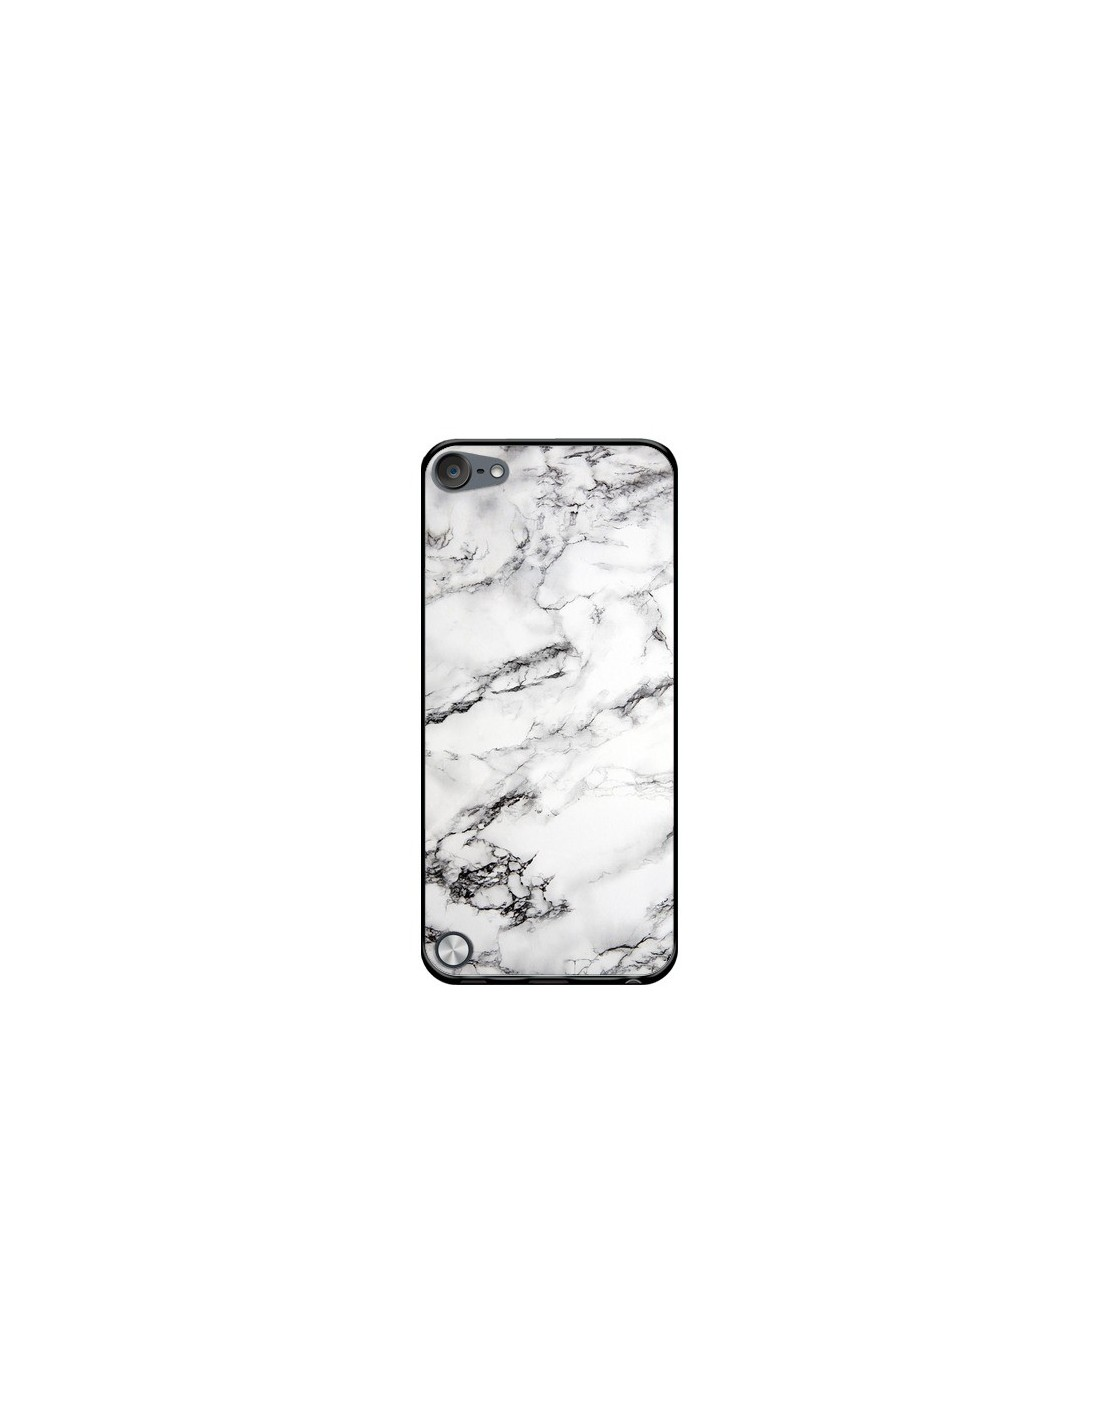 iphone 5 coque marbre